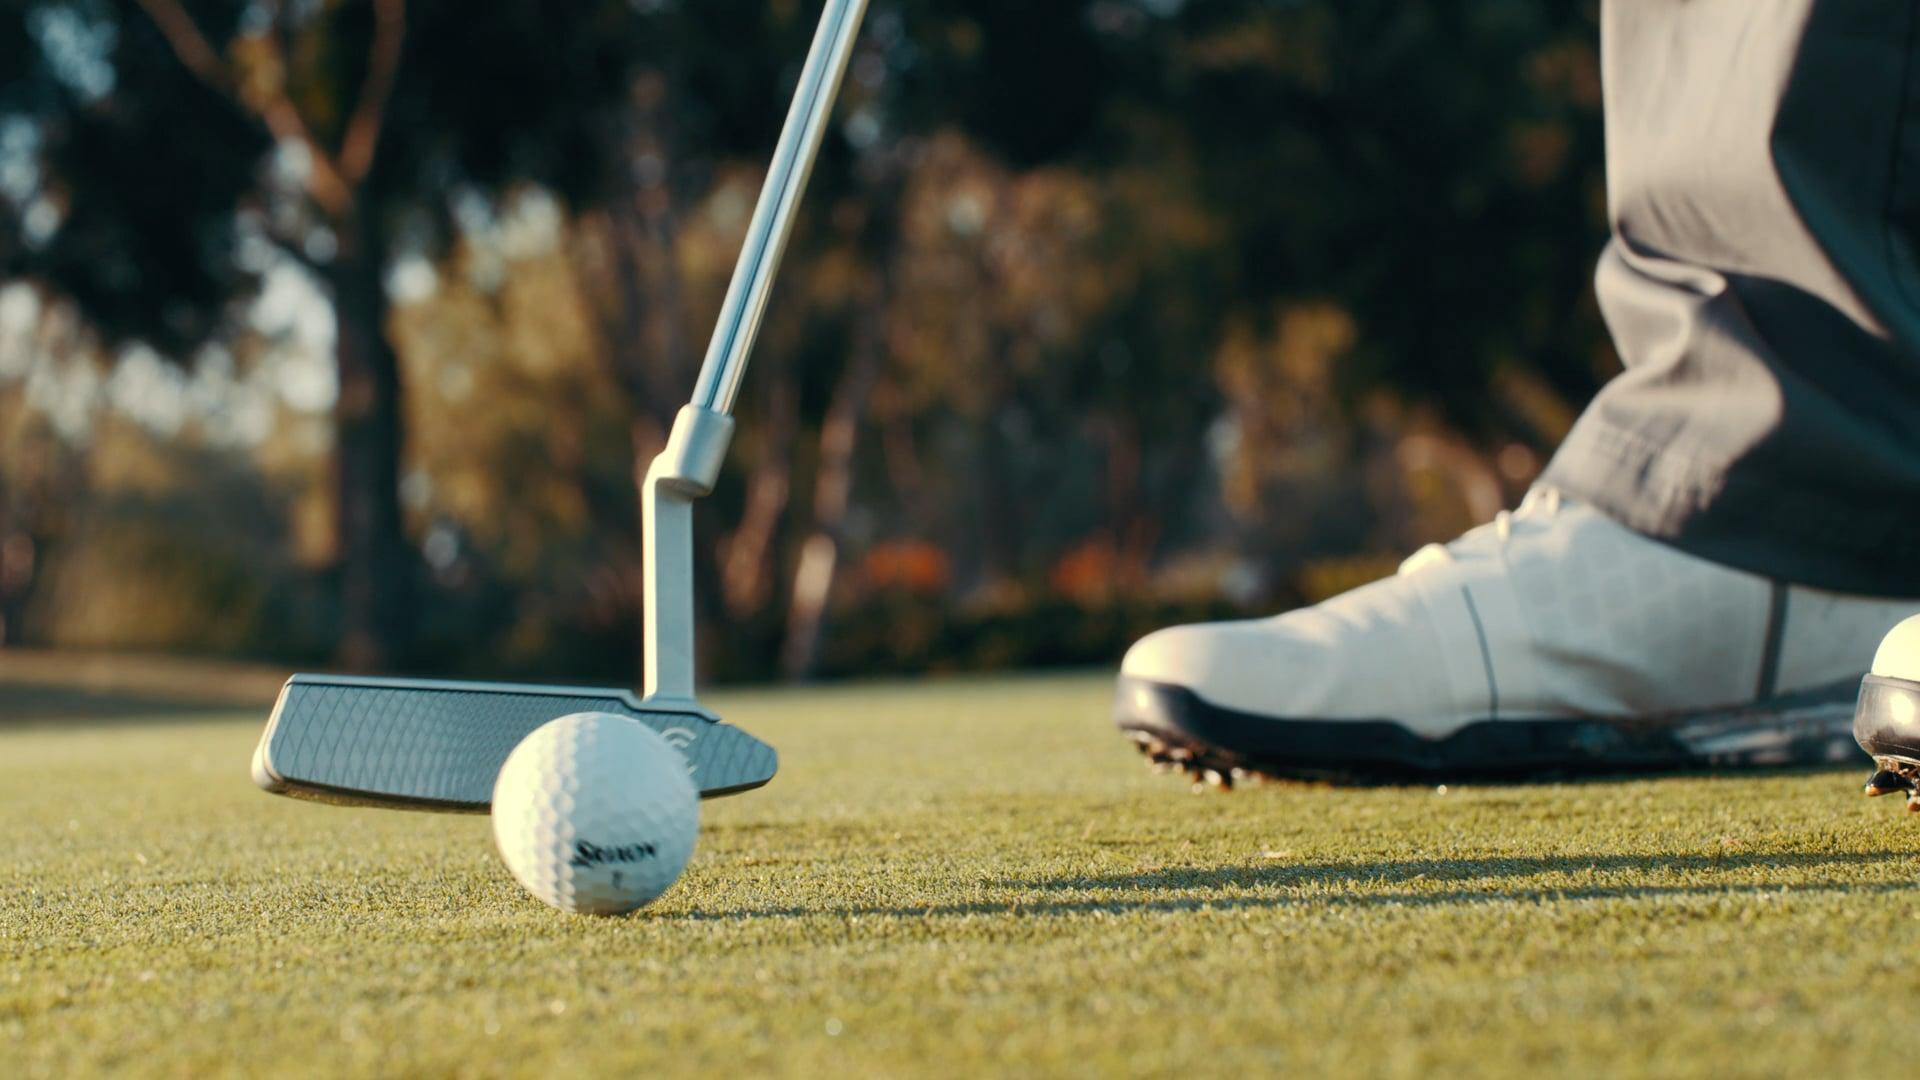 Cleveland Golf - TFI 2135 Satin Putters